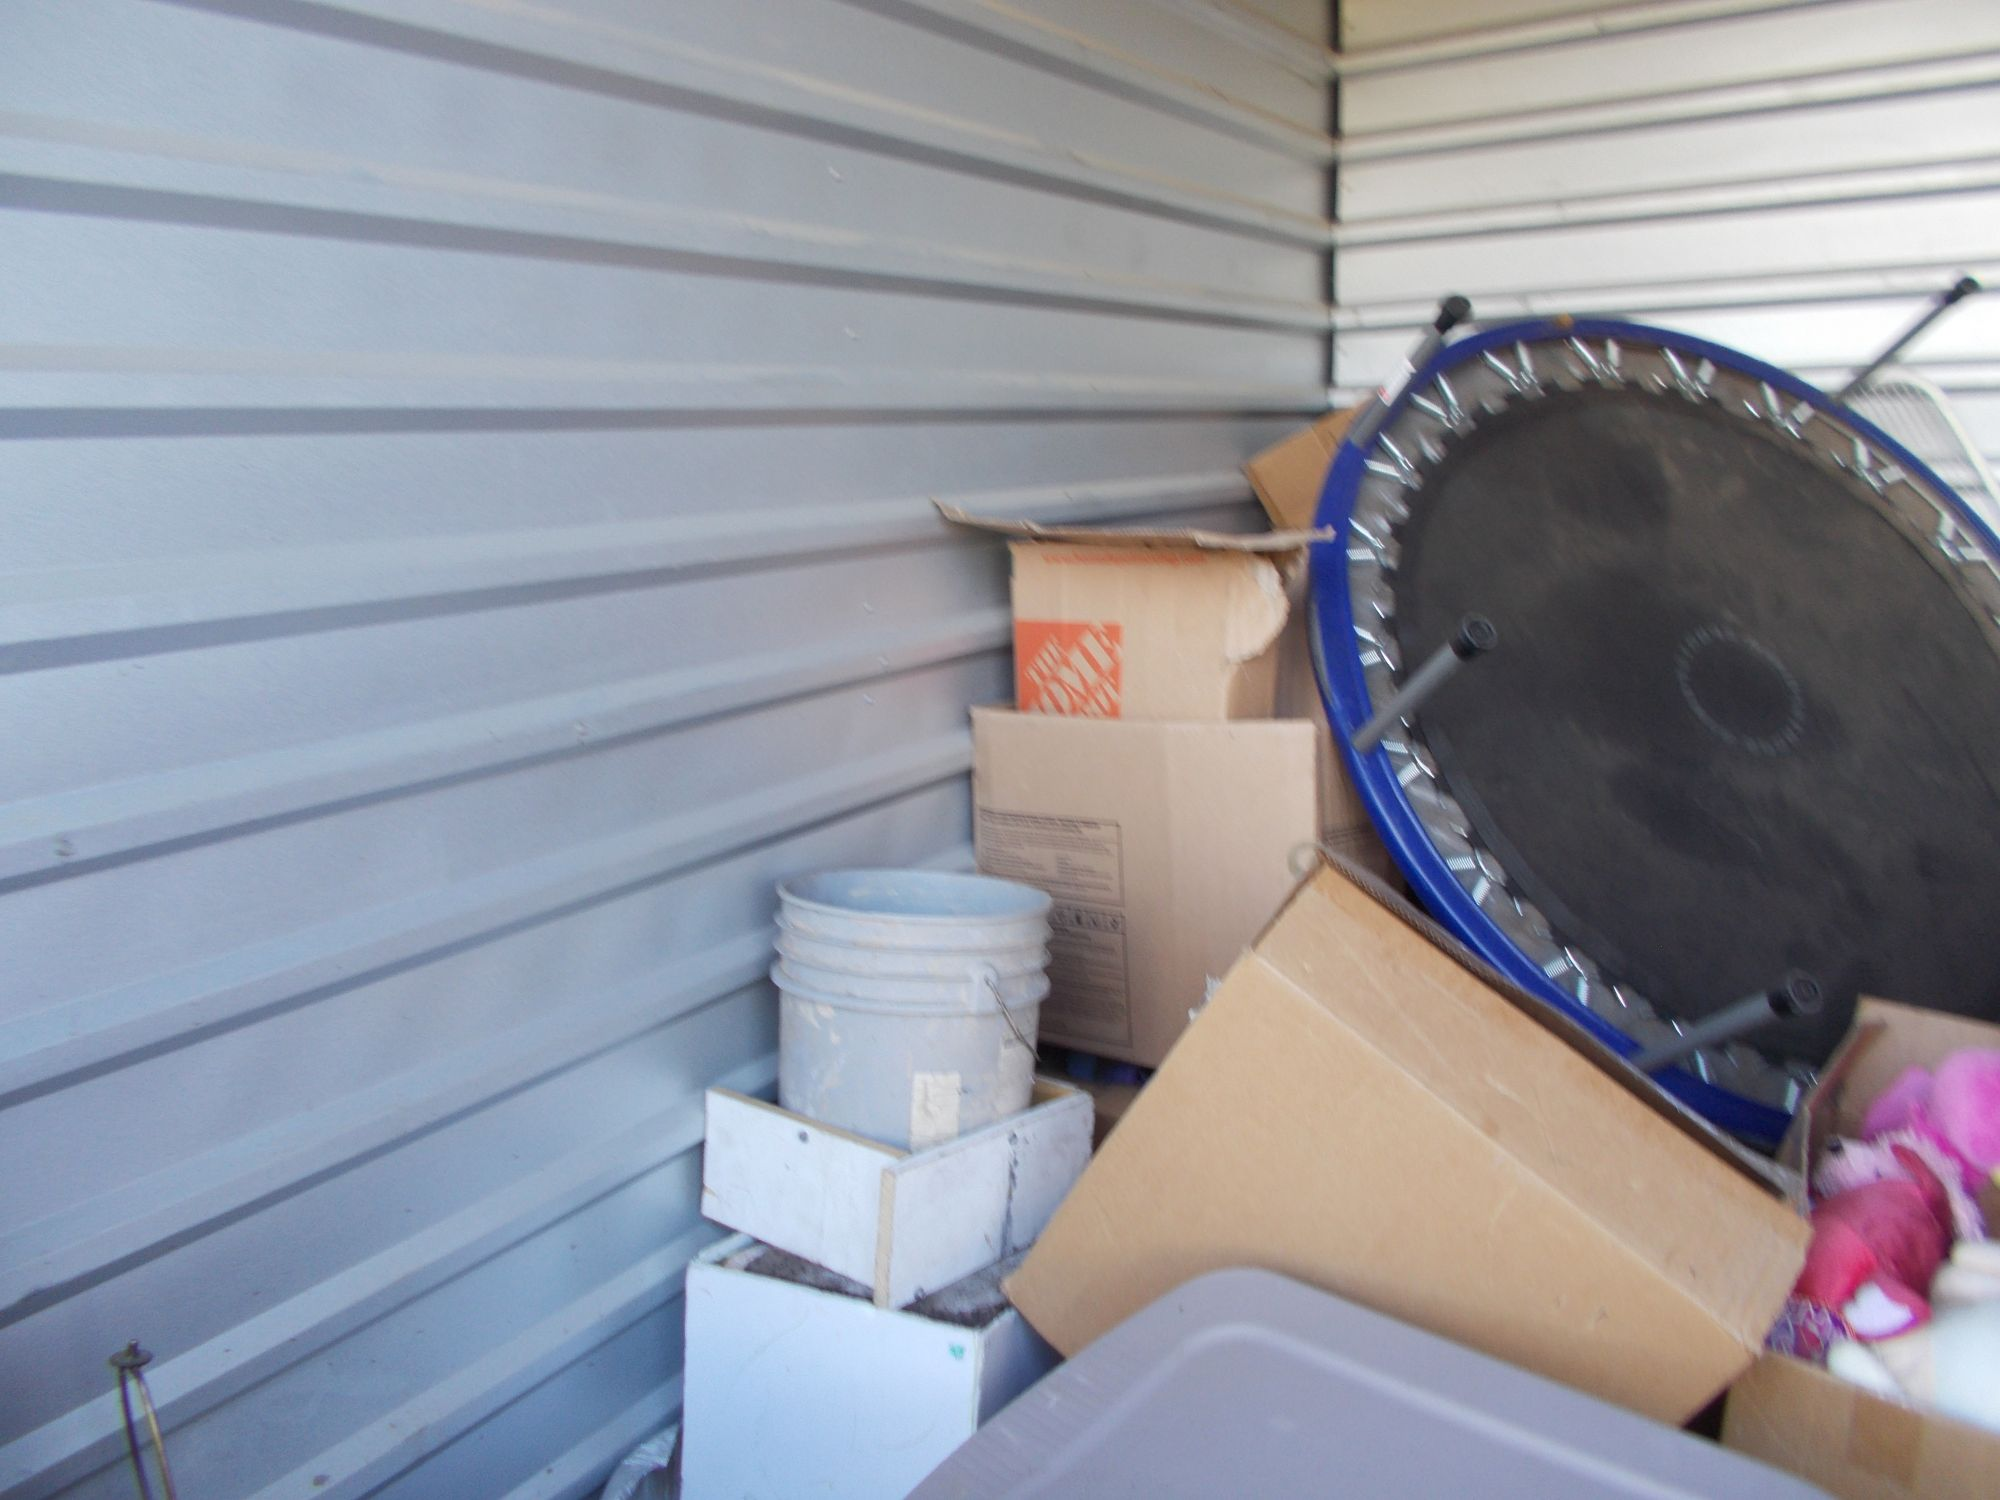 Storage Unit Auction 528339 Colorado Springs Co & Storage Unit Auctions Colorado Springs - Listitdallas